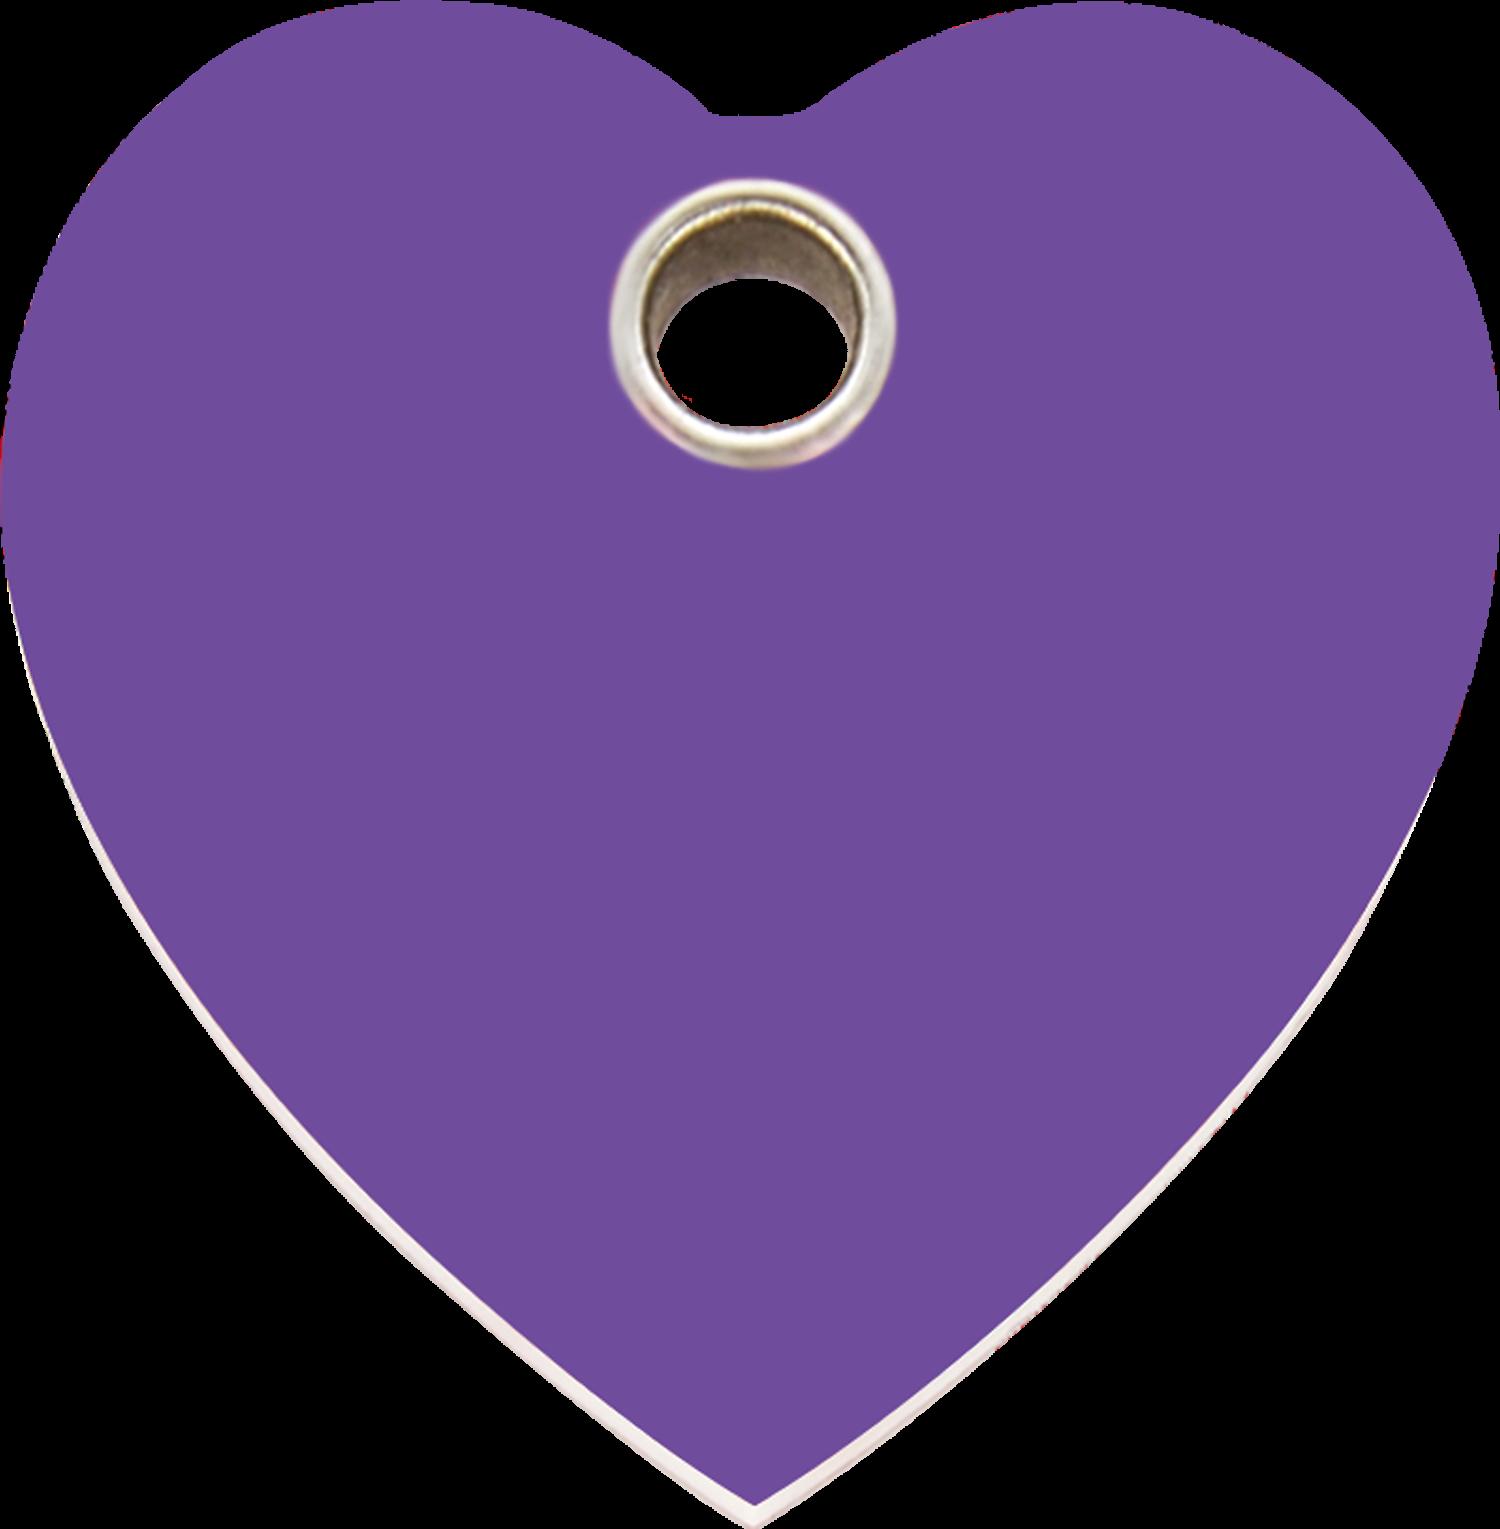 Red dingo plastic tag heart purple 04 ht pu 4htps 4htpm 4htpl image buycottarizona